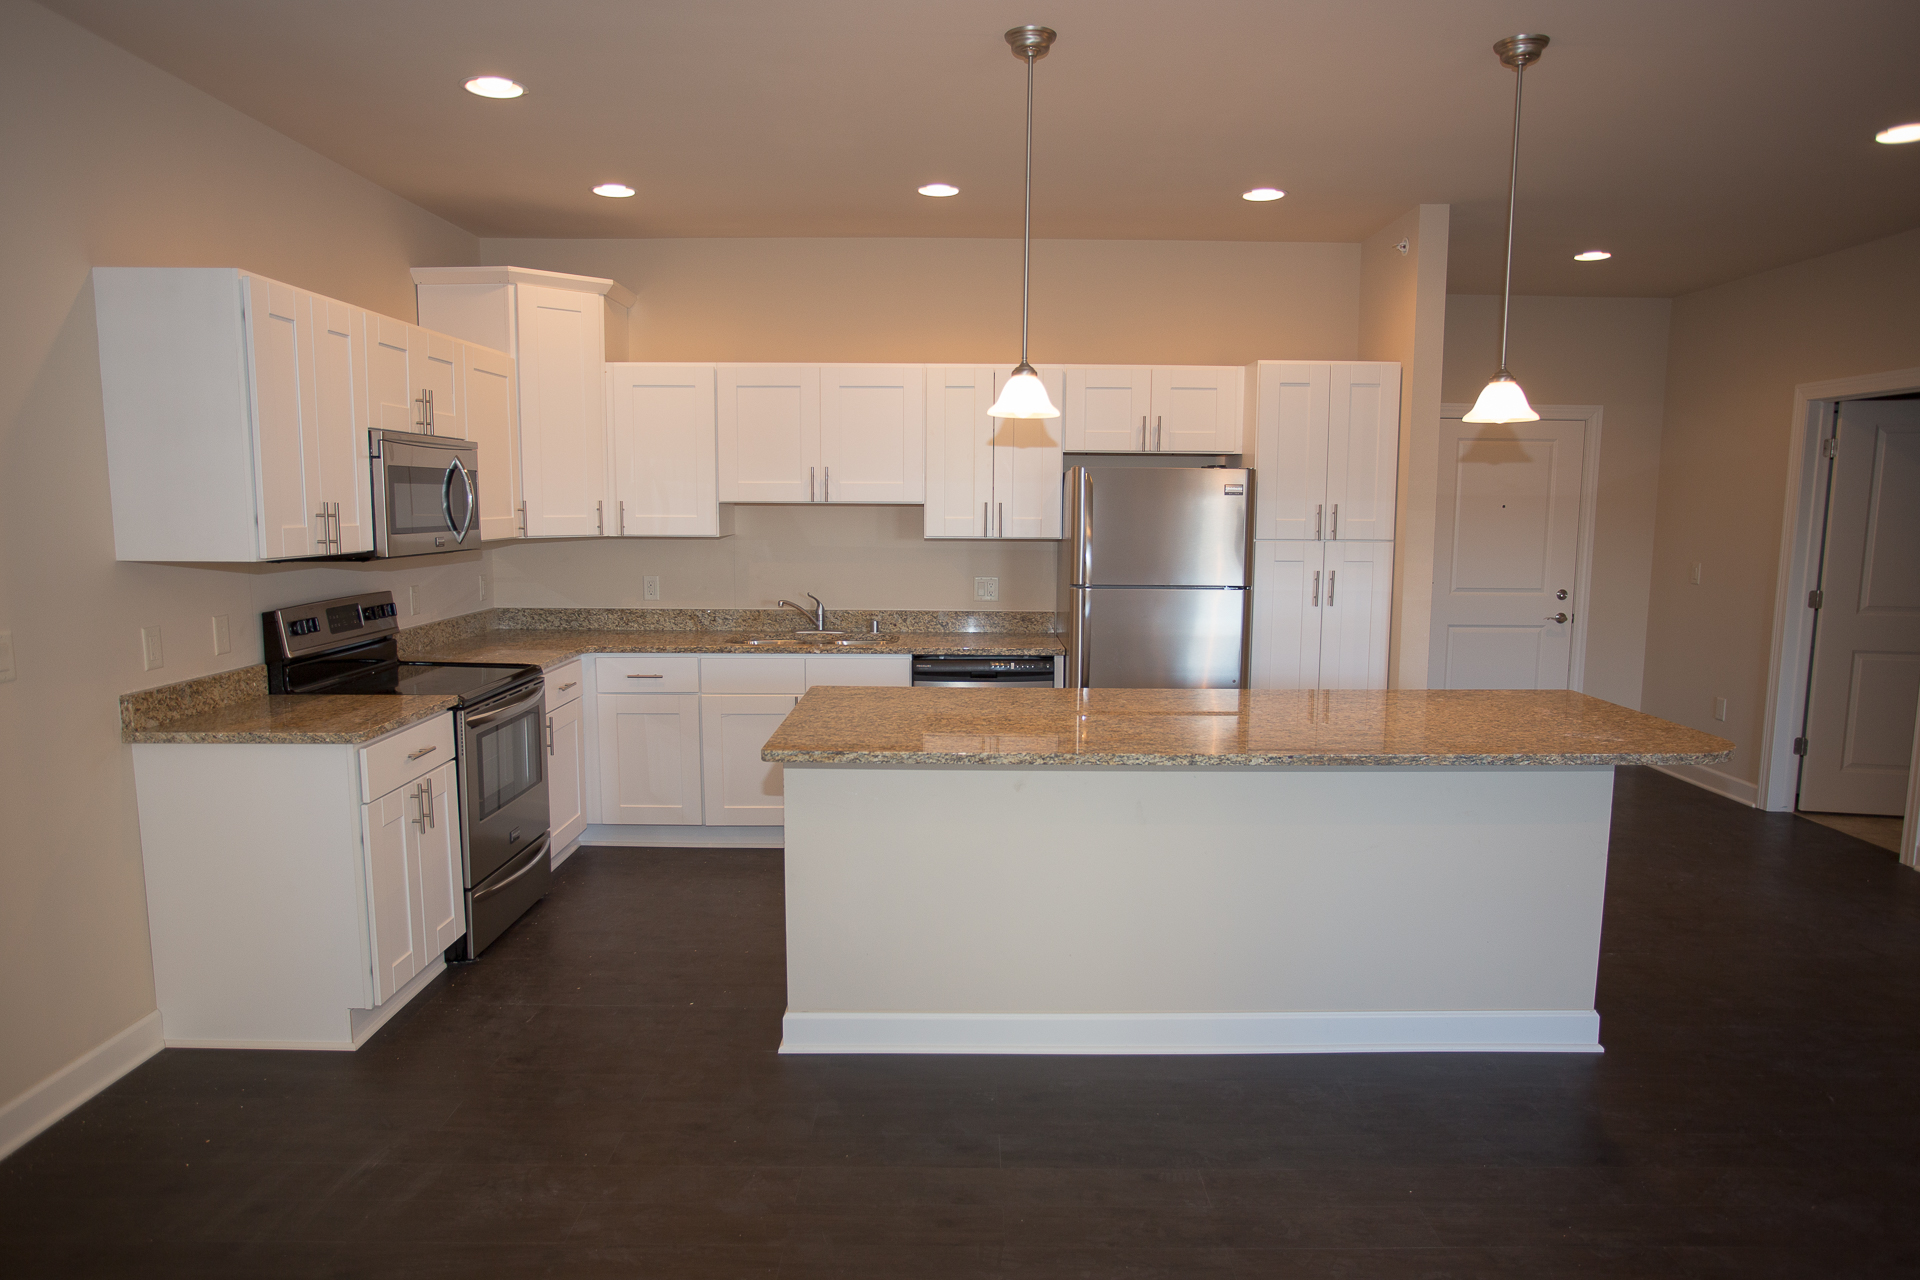 B1 Kitchen Zoomed